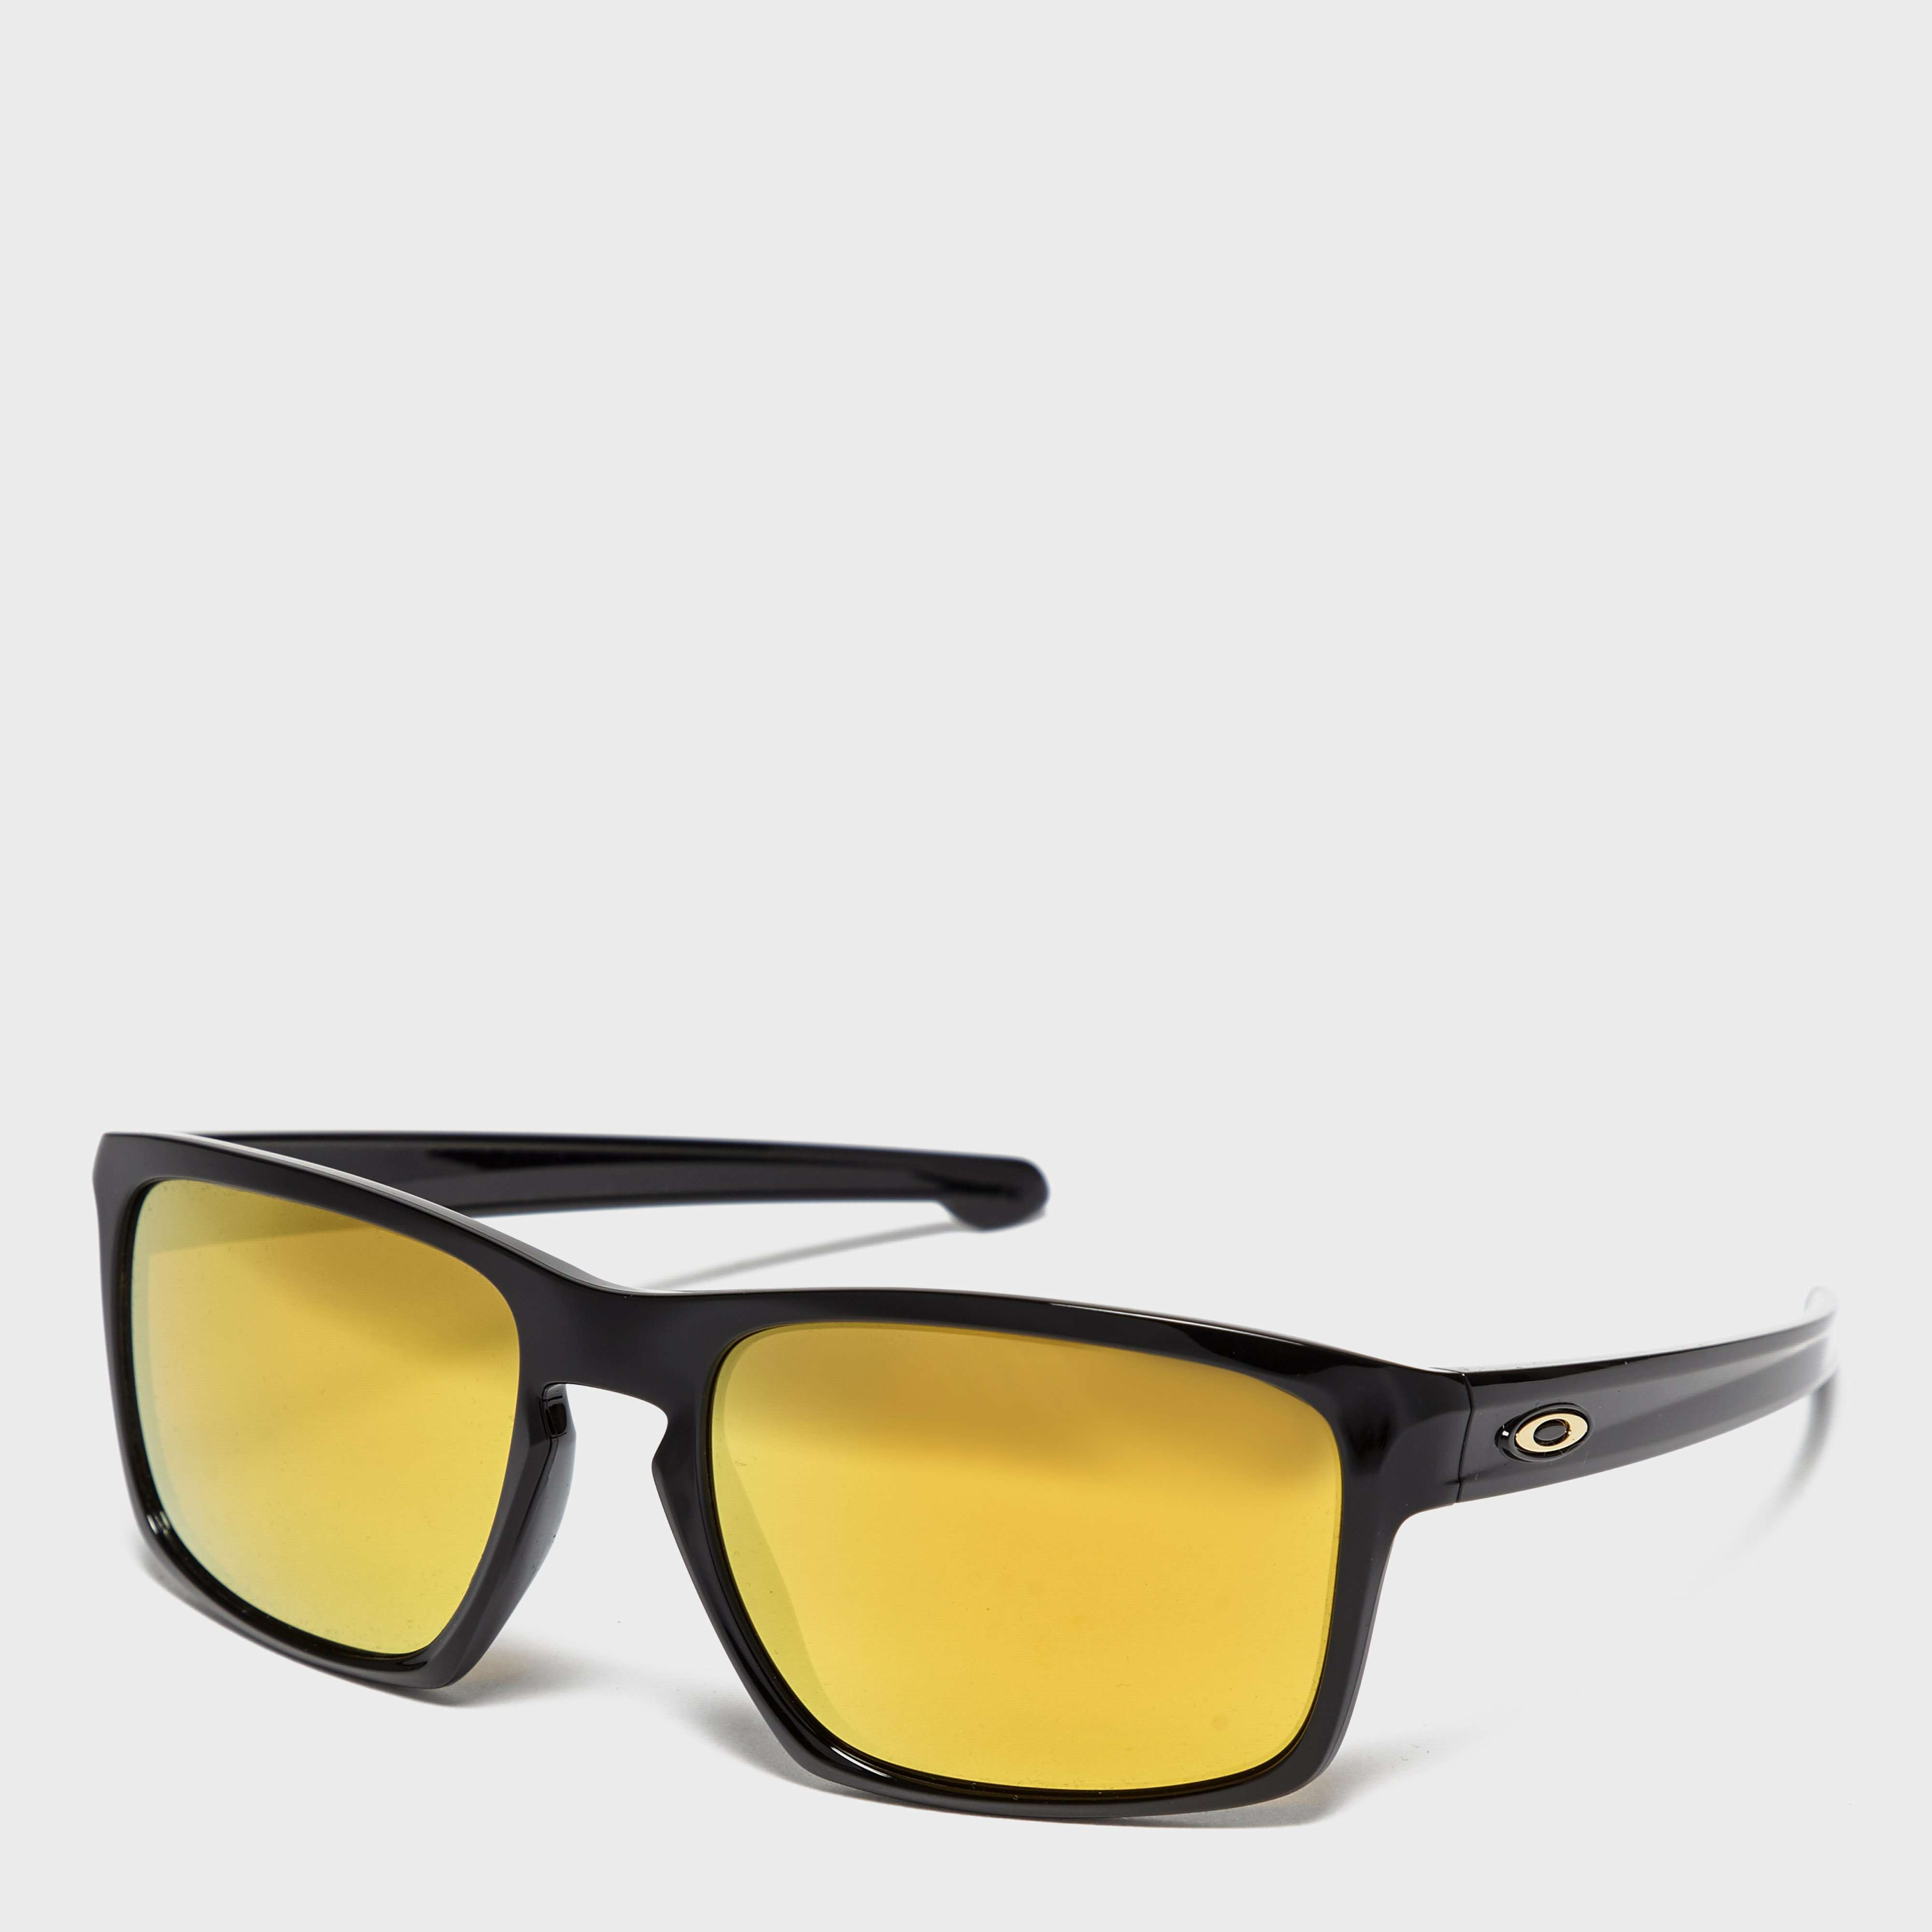 OAKLEY Silver™ 24K Iridium Sunglasses